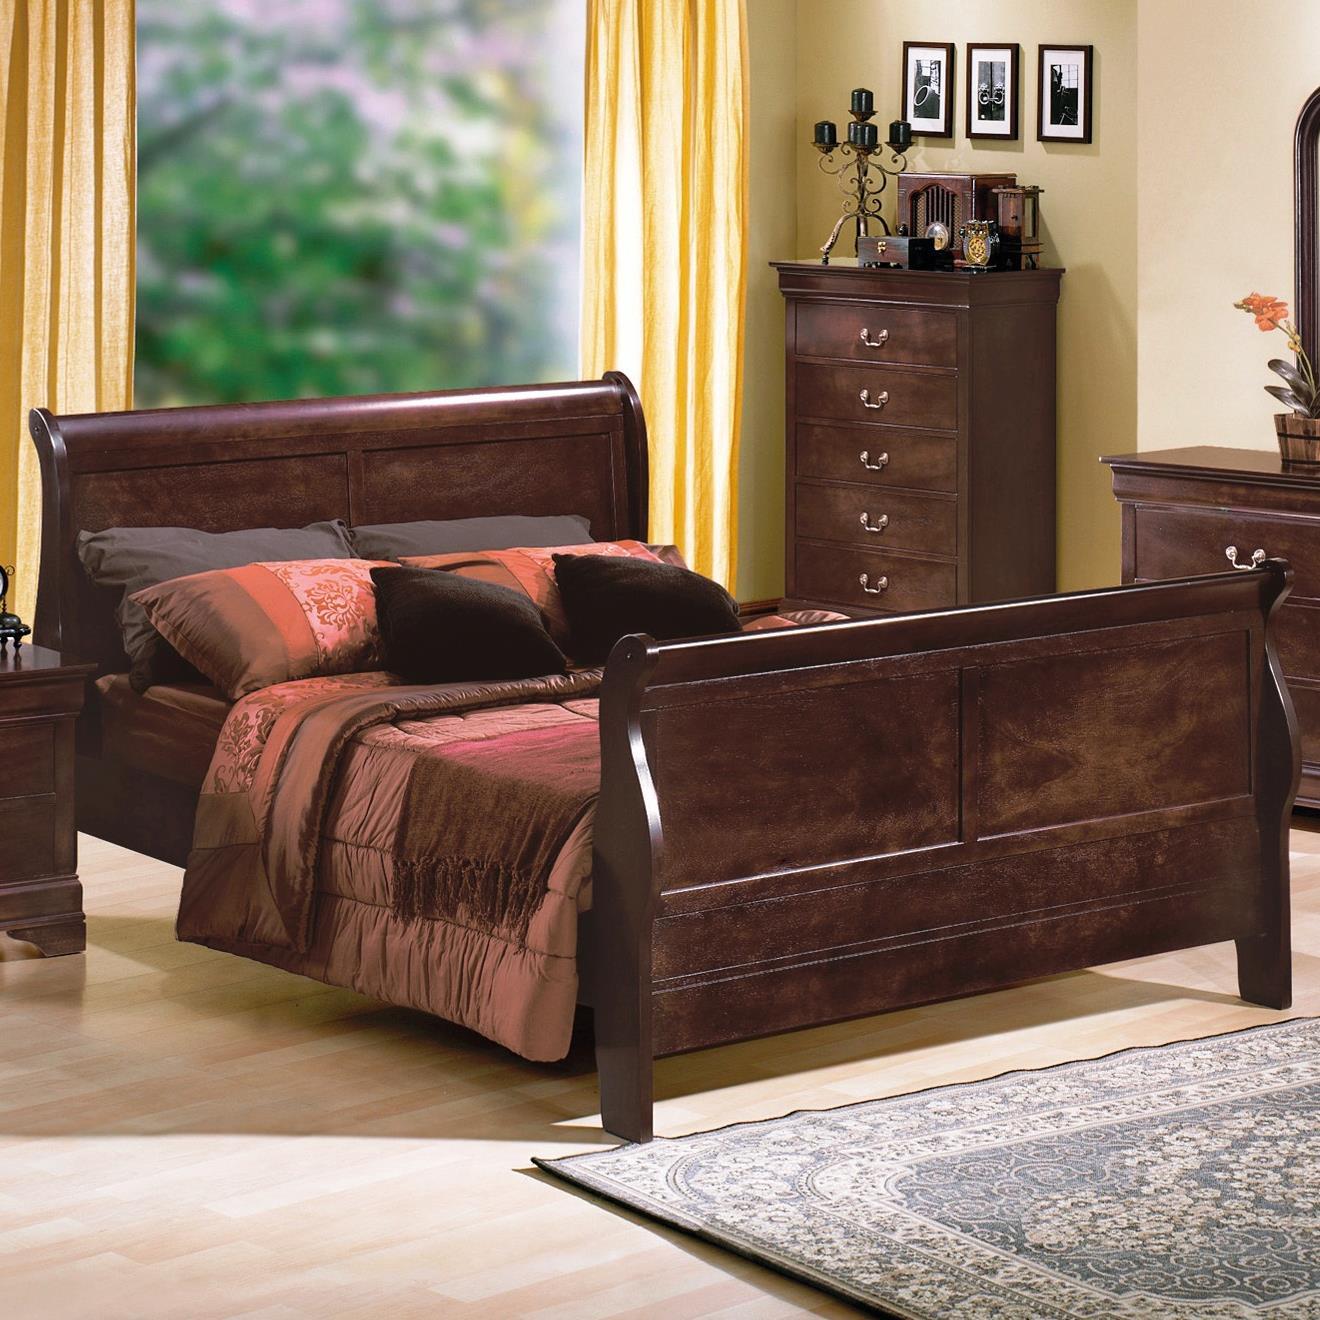 Crown Mark Louis Phillipe Full Bed - Item Number: B3775-F-HBFB+RAIL